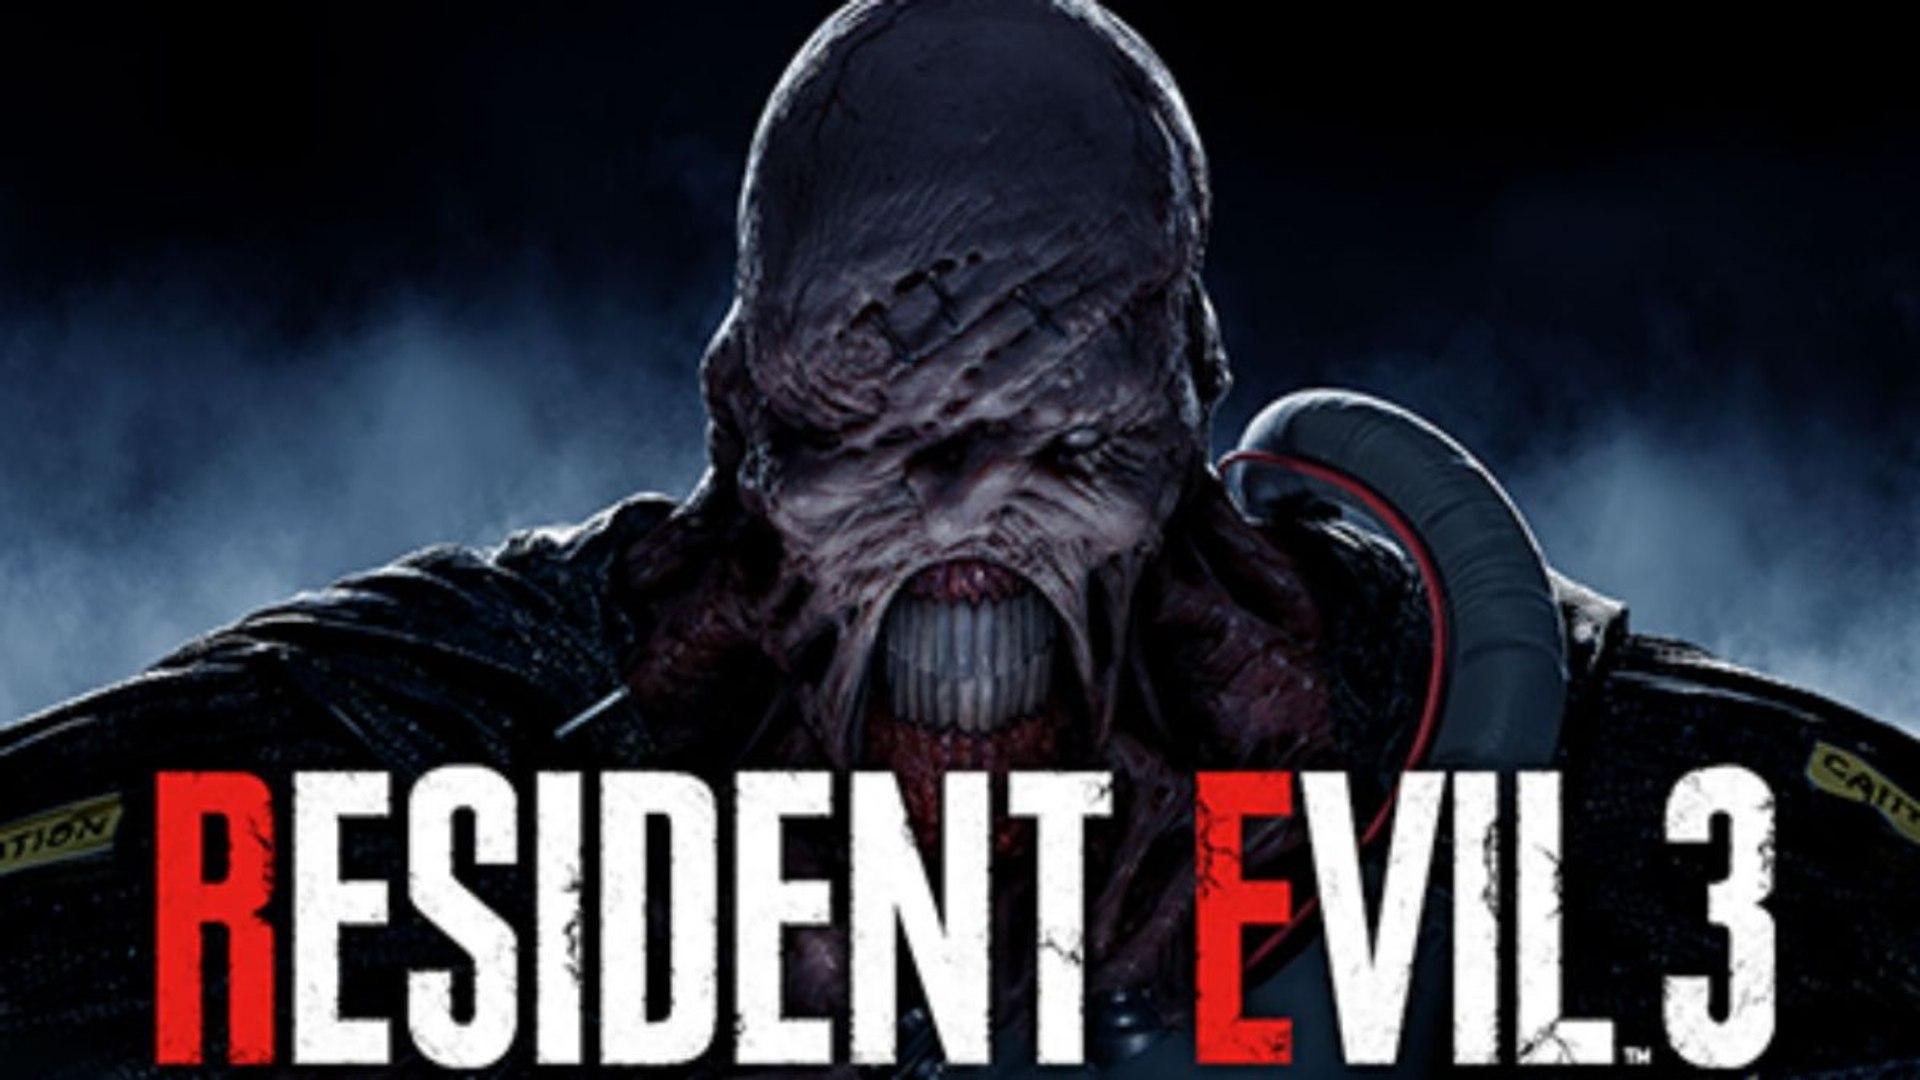 Resident Evil 3 Remake Official Announce Trailer 2020 Video